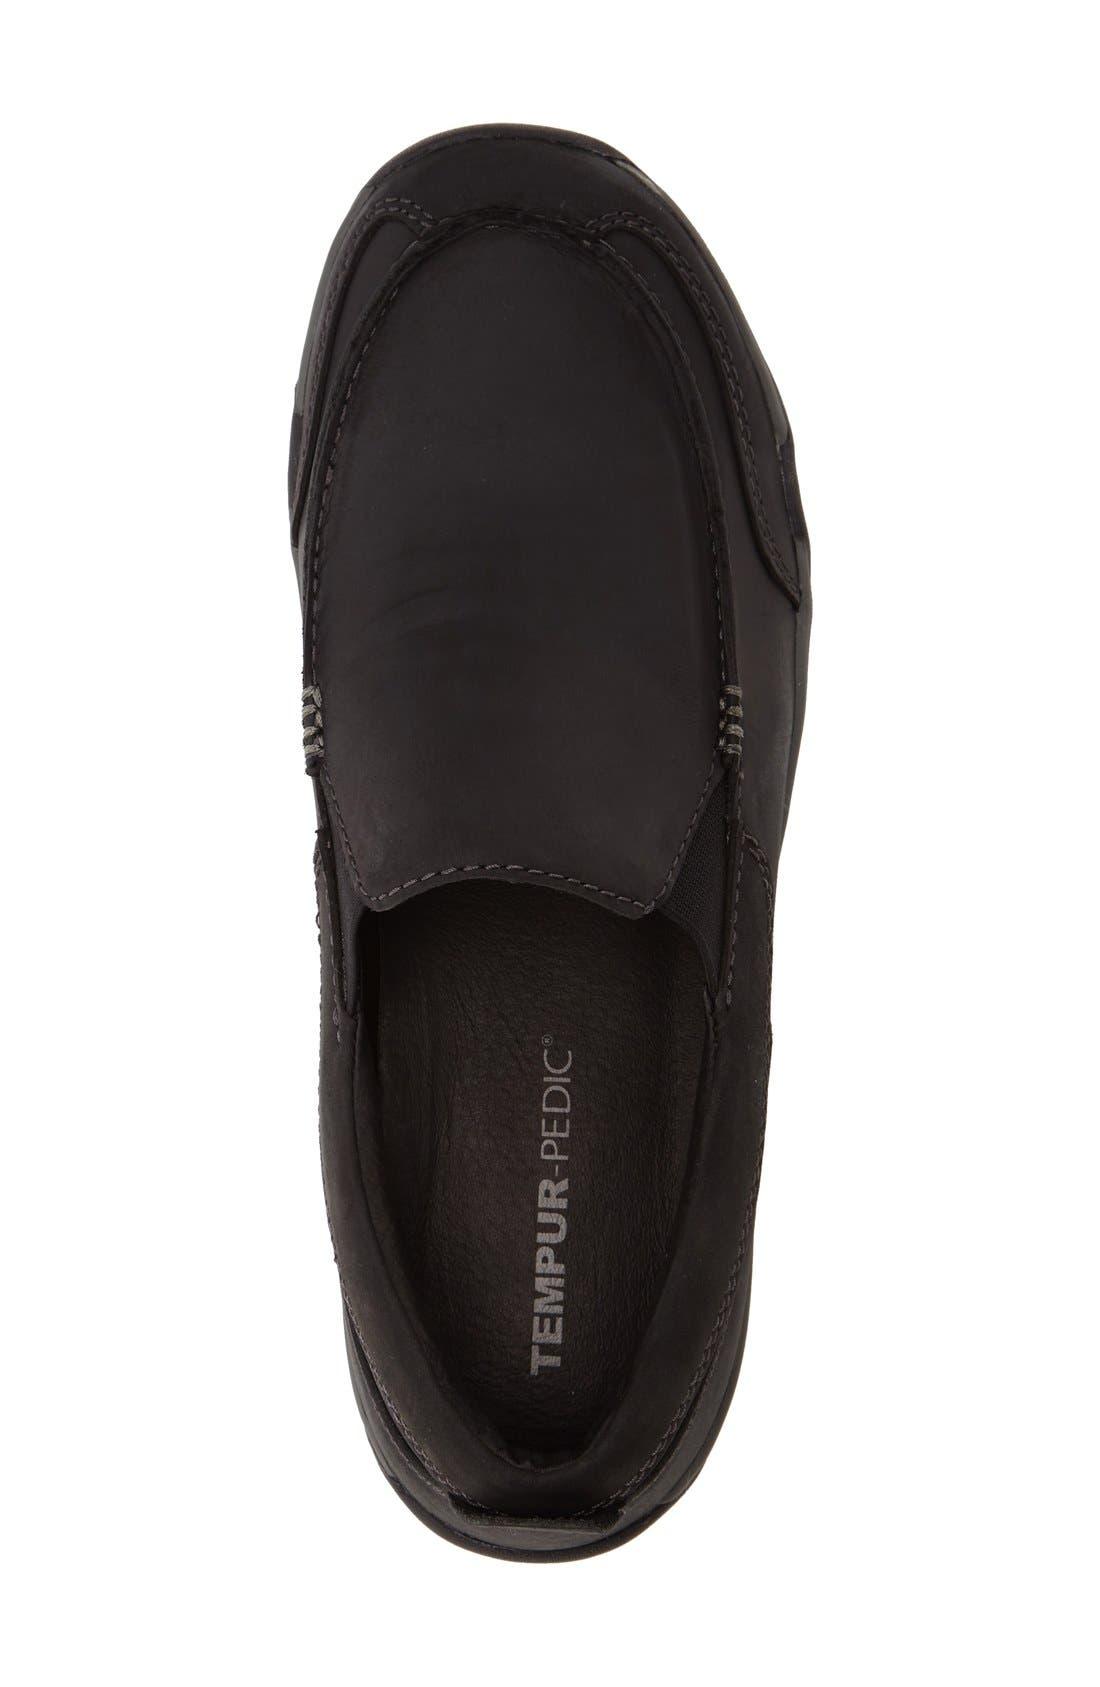 Markis Moc Toe Slip-On,                             Alternate thumbnail 3, color,                             Black Leather